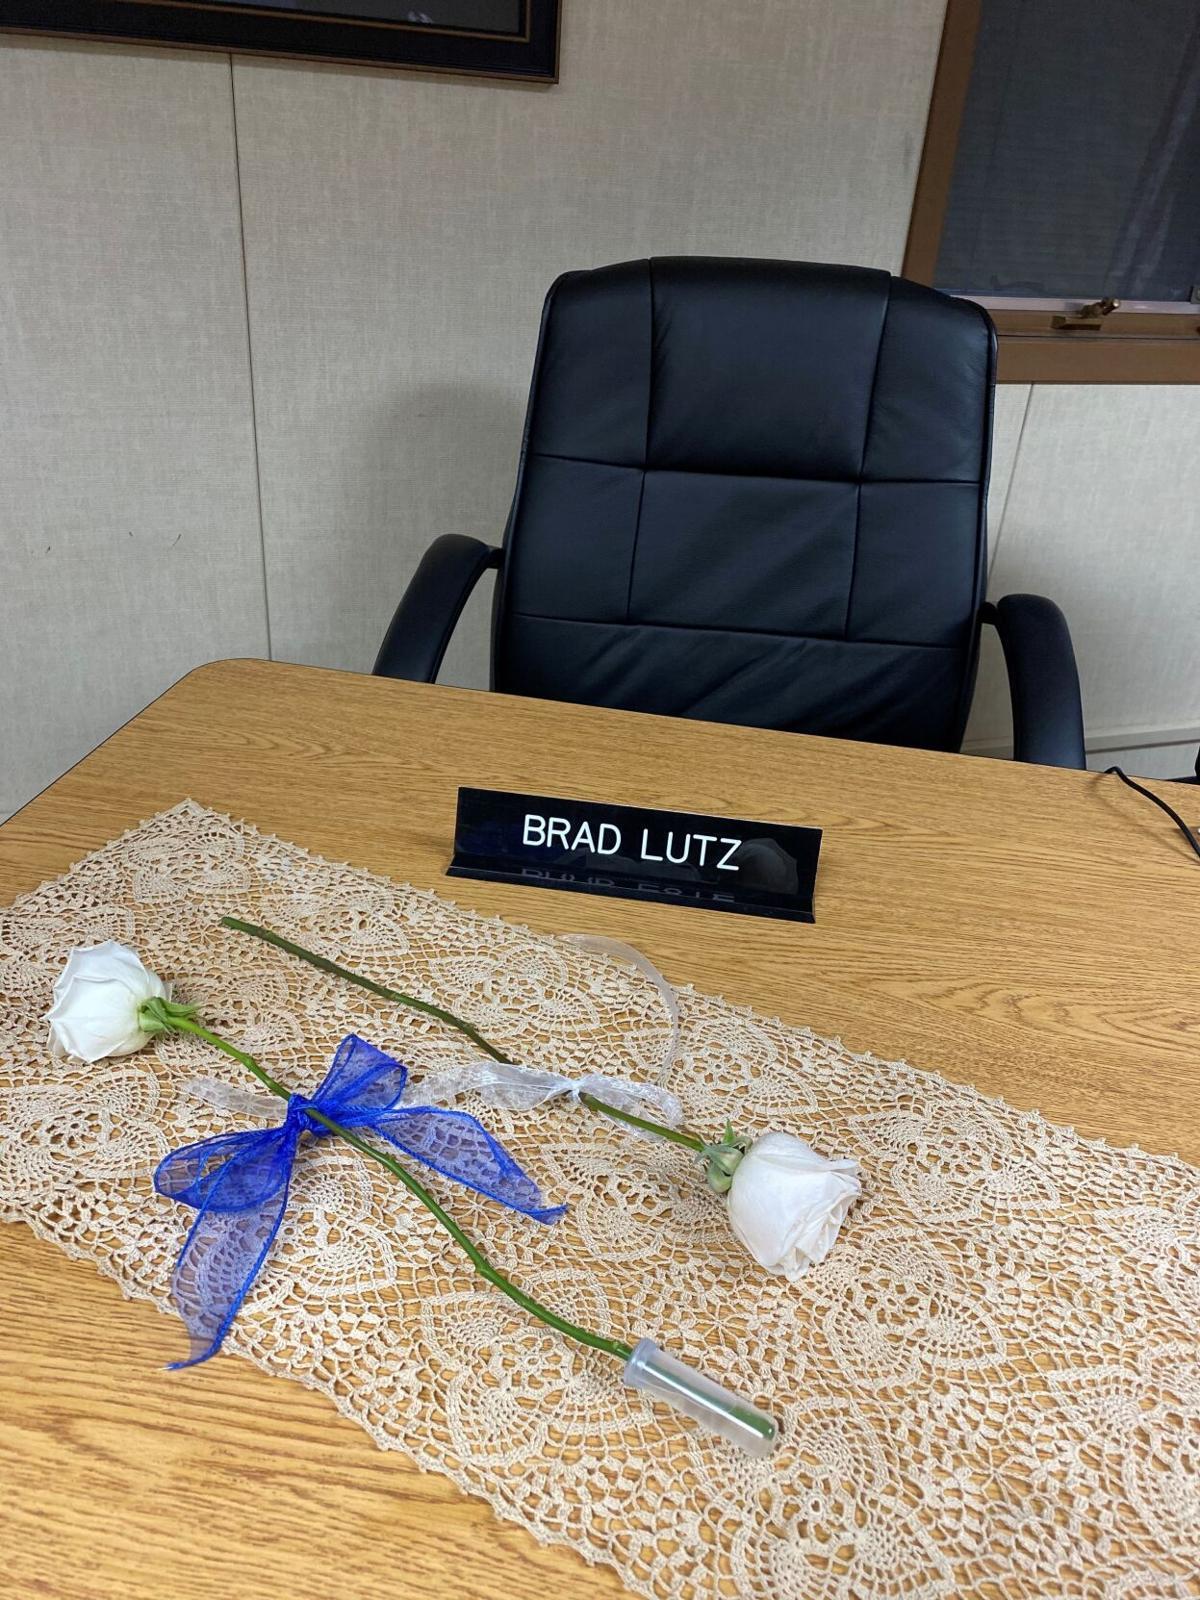 Brad Lutz's chair photo